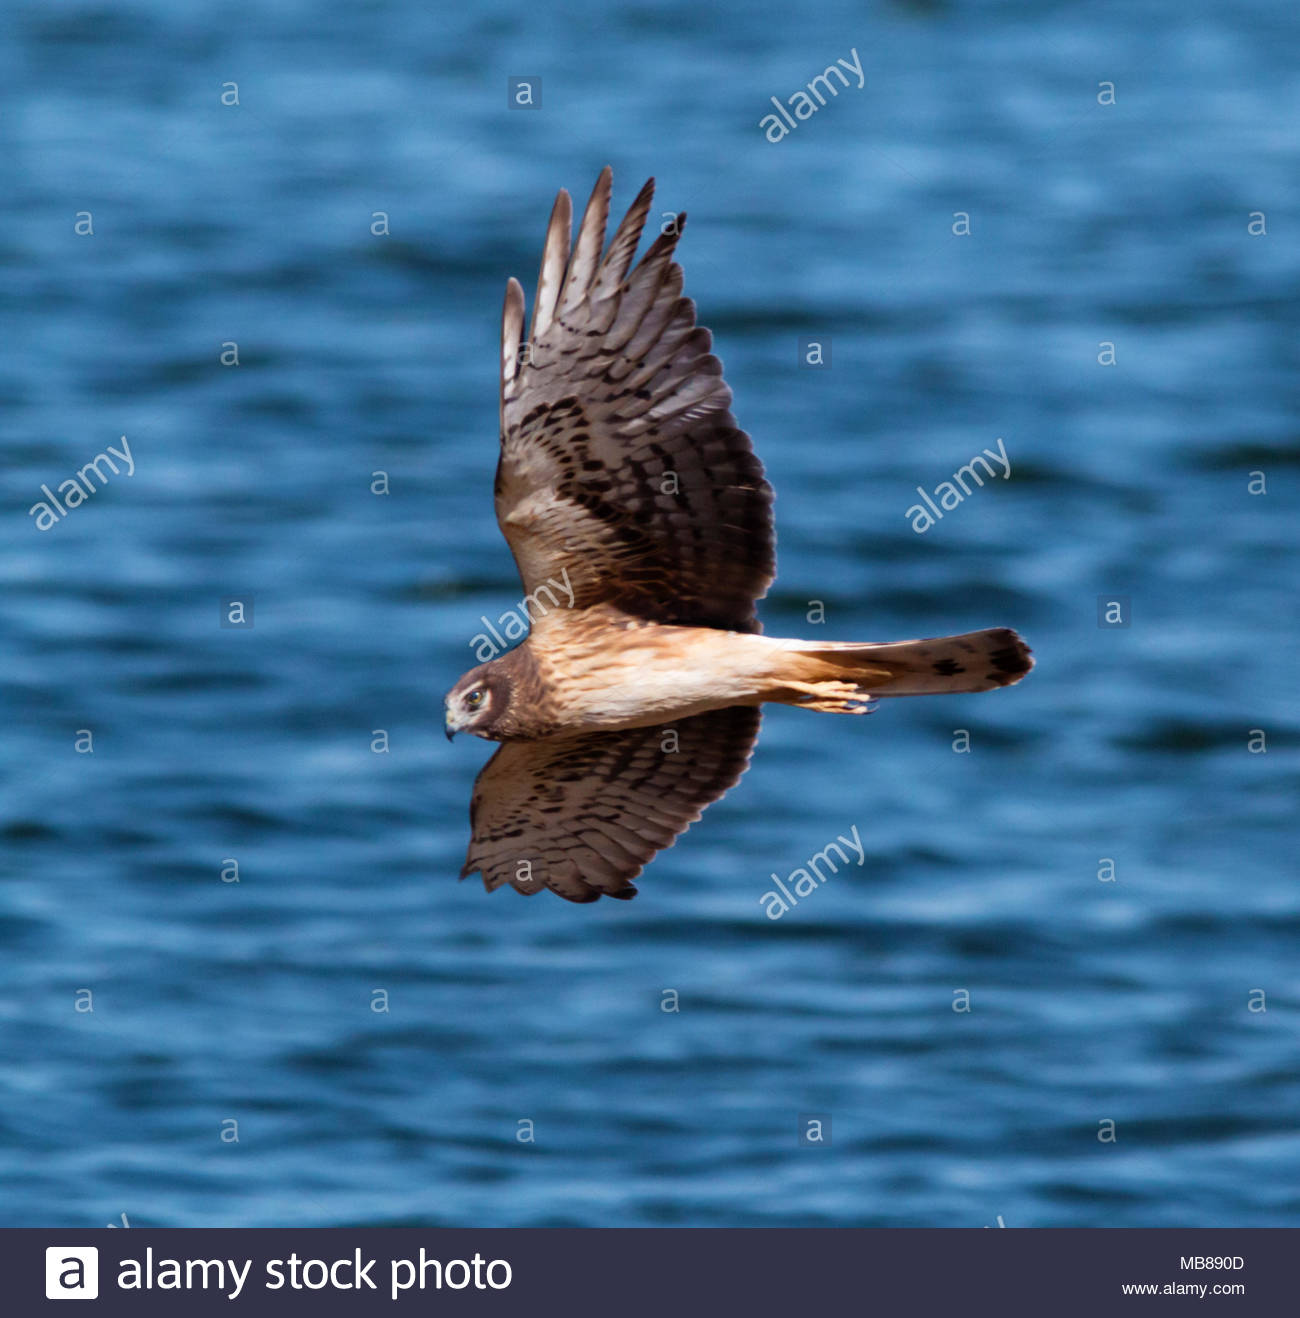 Northern Harrier, Circus cyaneus, female, Marsh hawk, flying in Arizona, USA Stock Photo